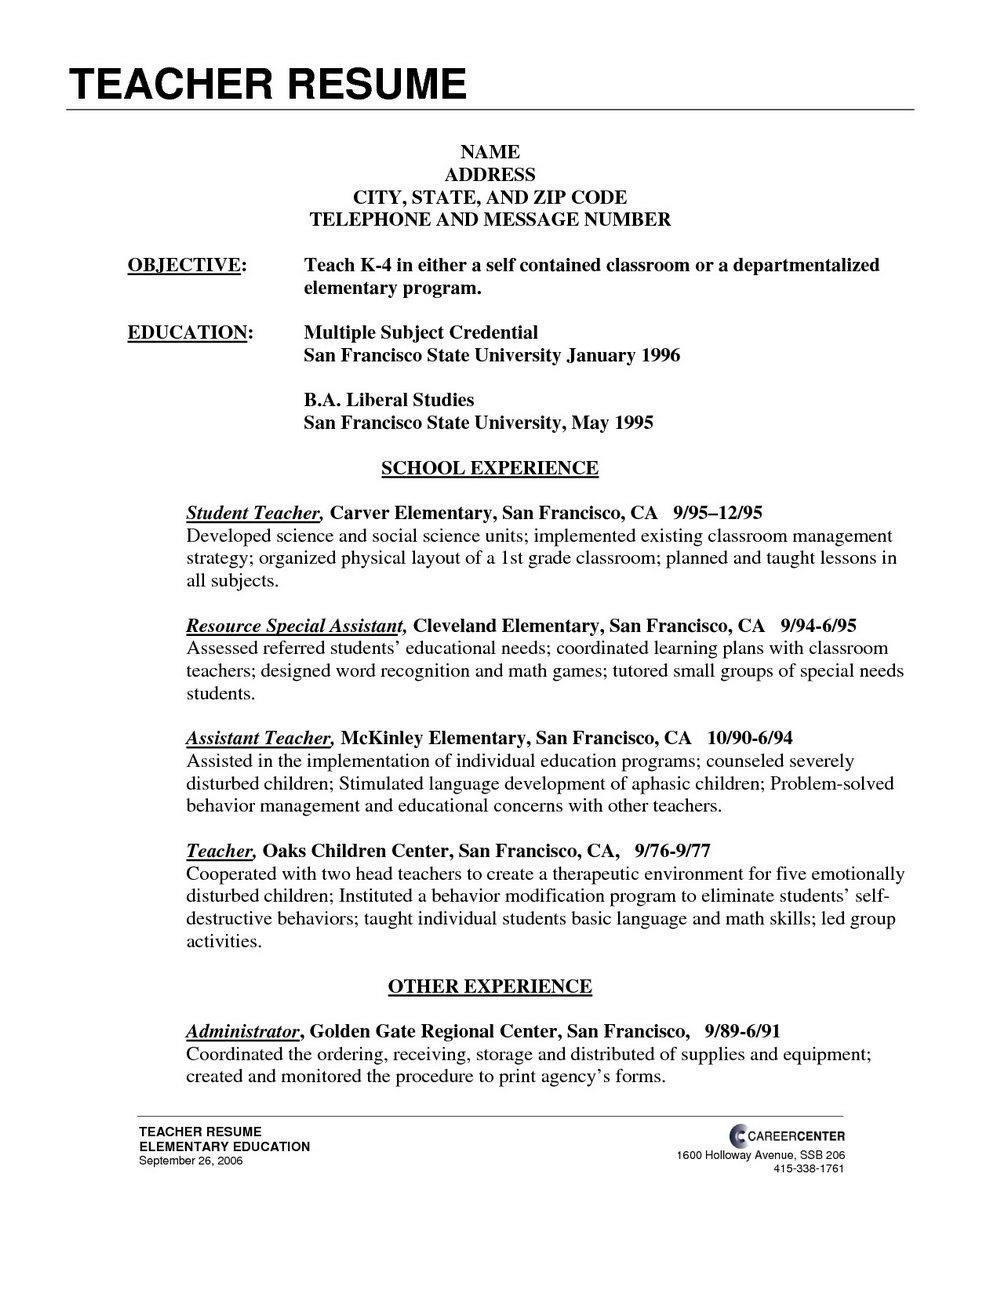 Student Resume Templates Free